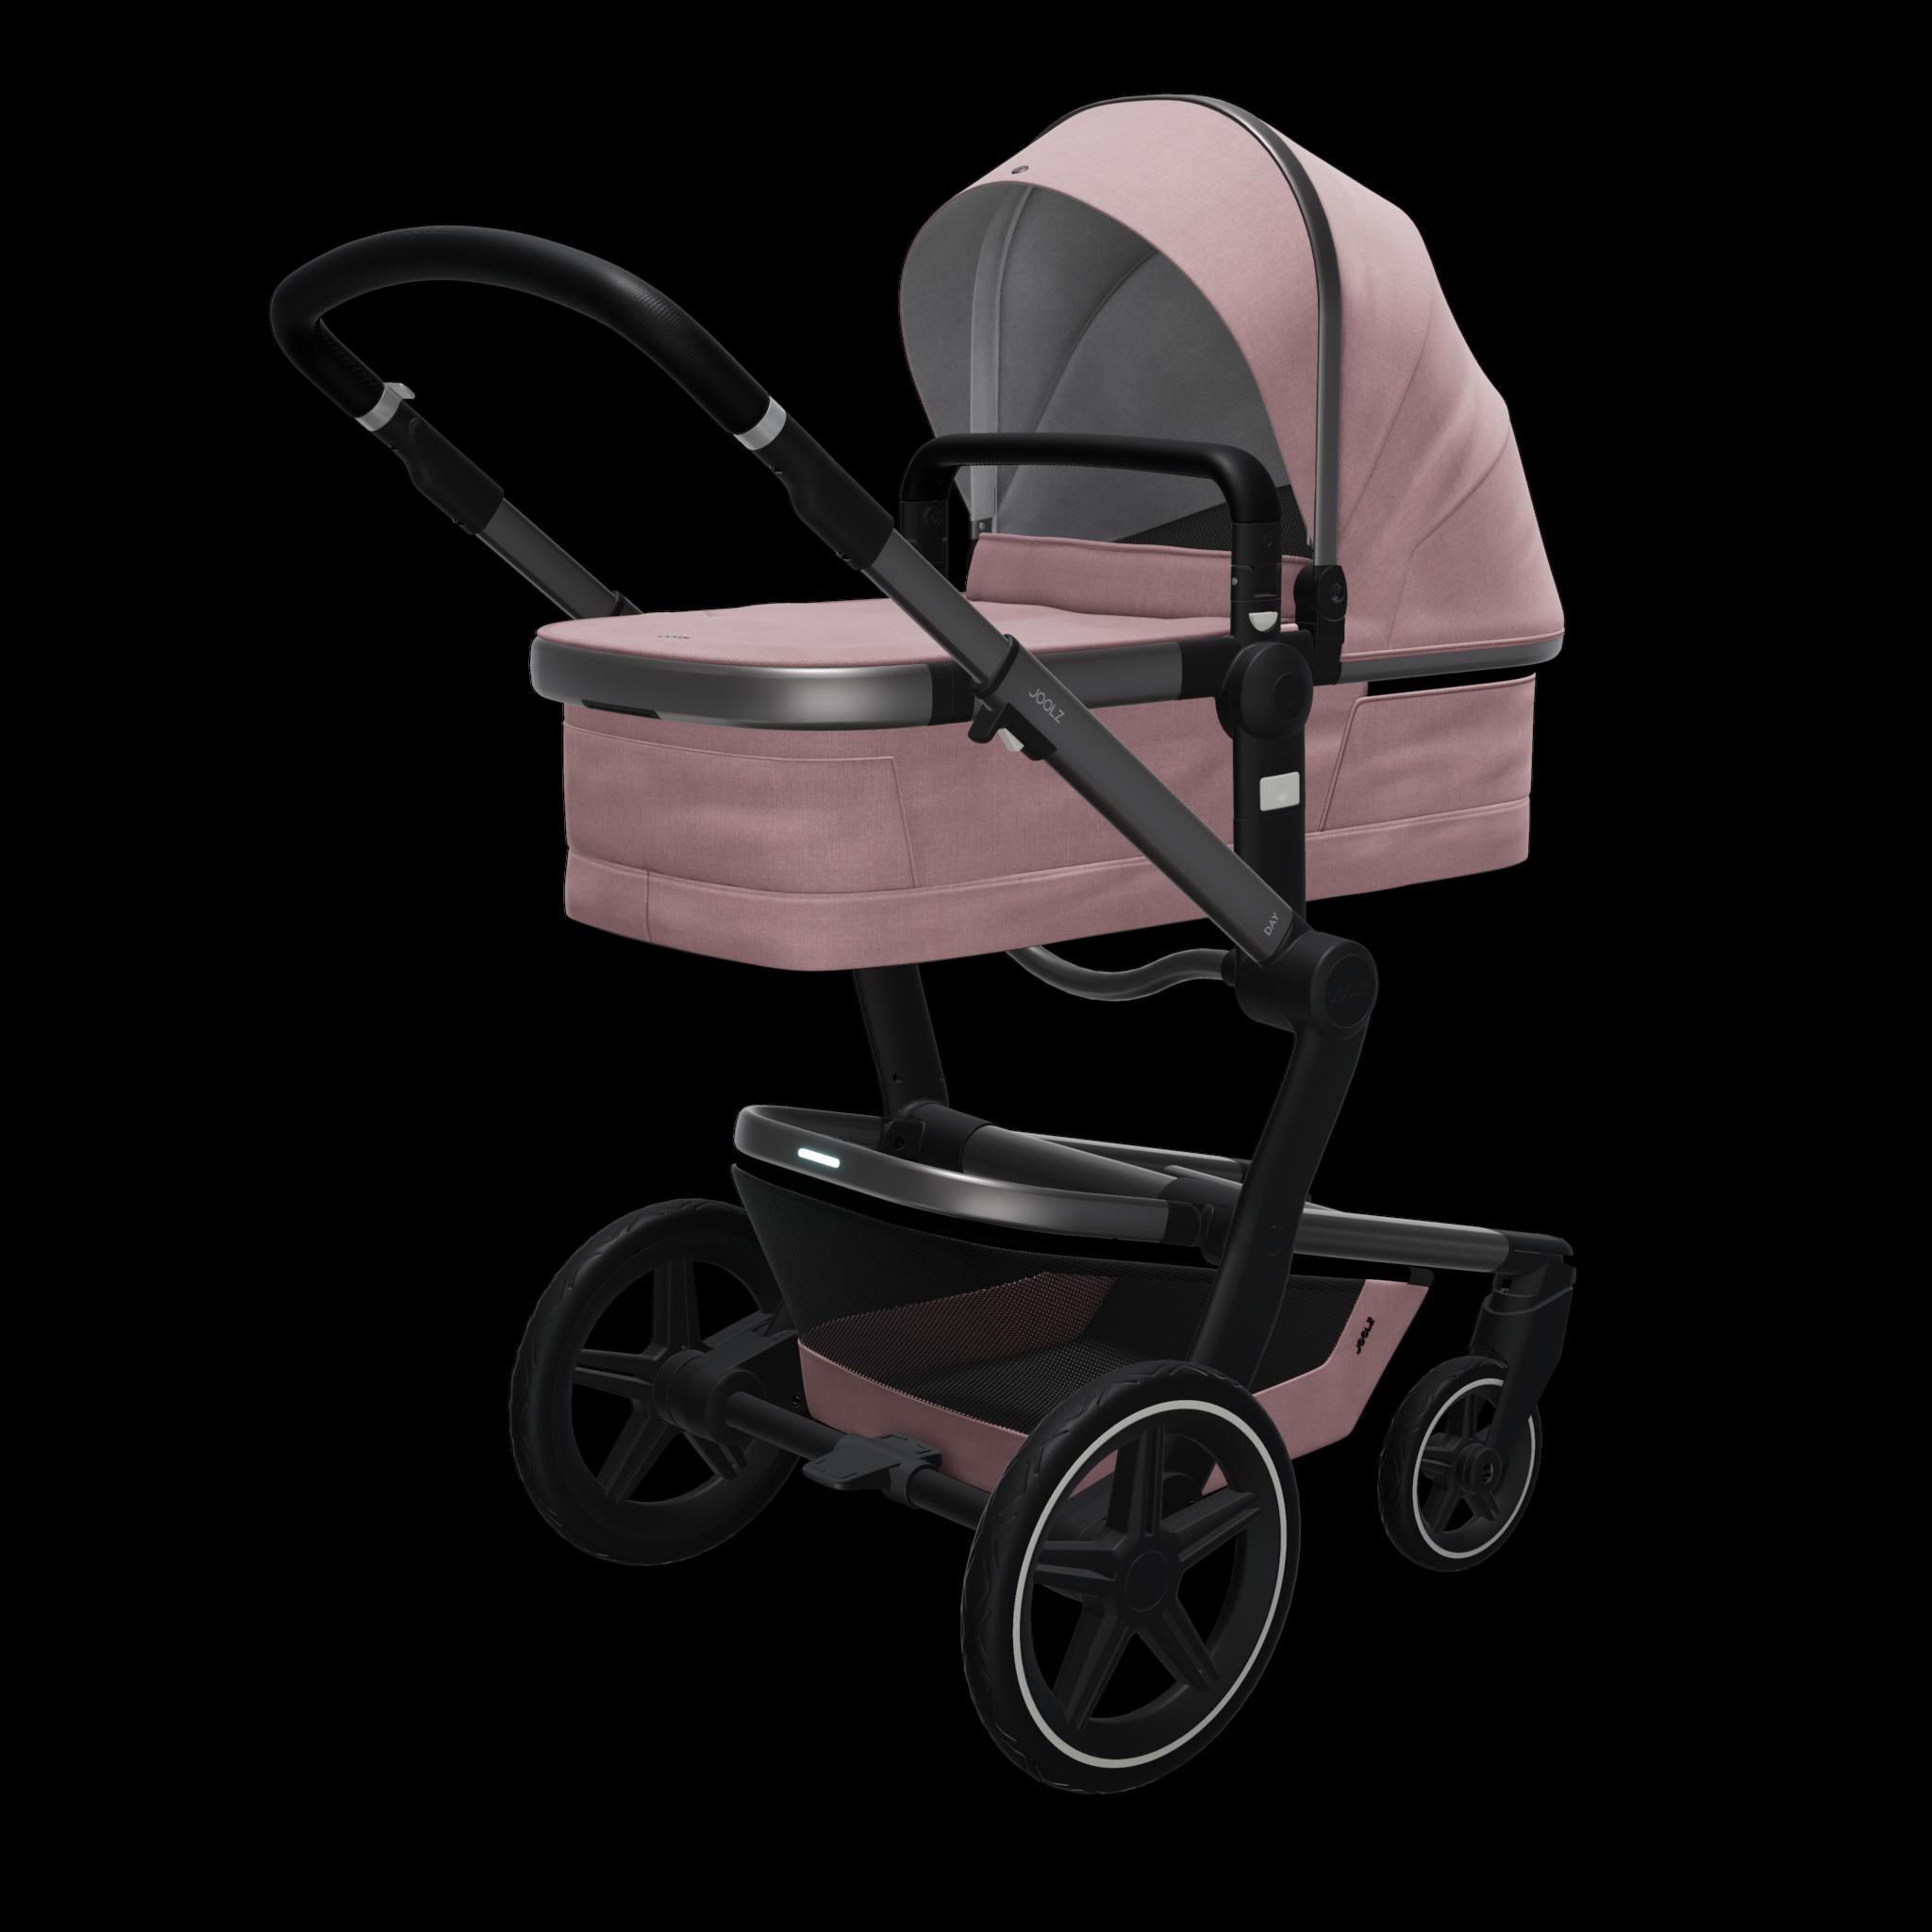 Joolz Joolz Day+ Kinderwagen Premium Pink